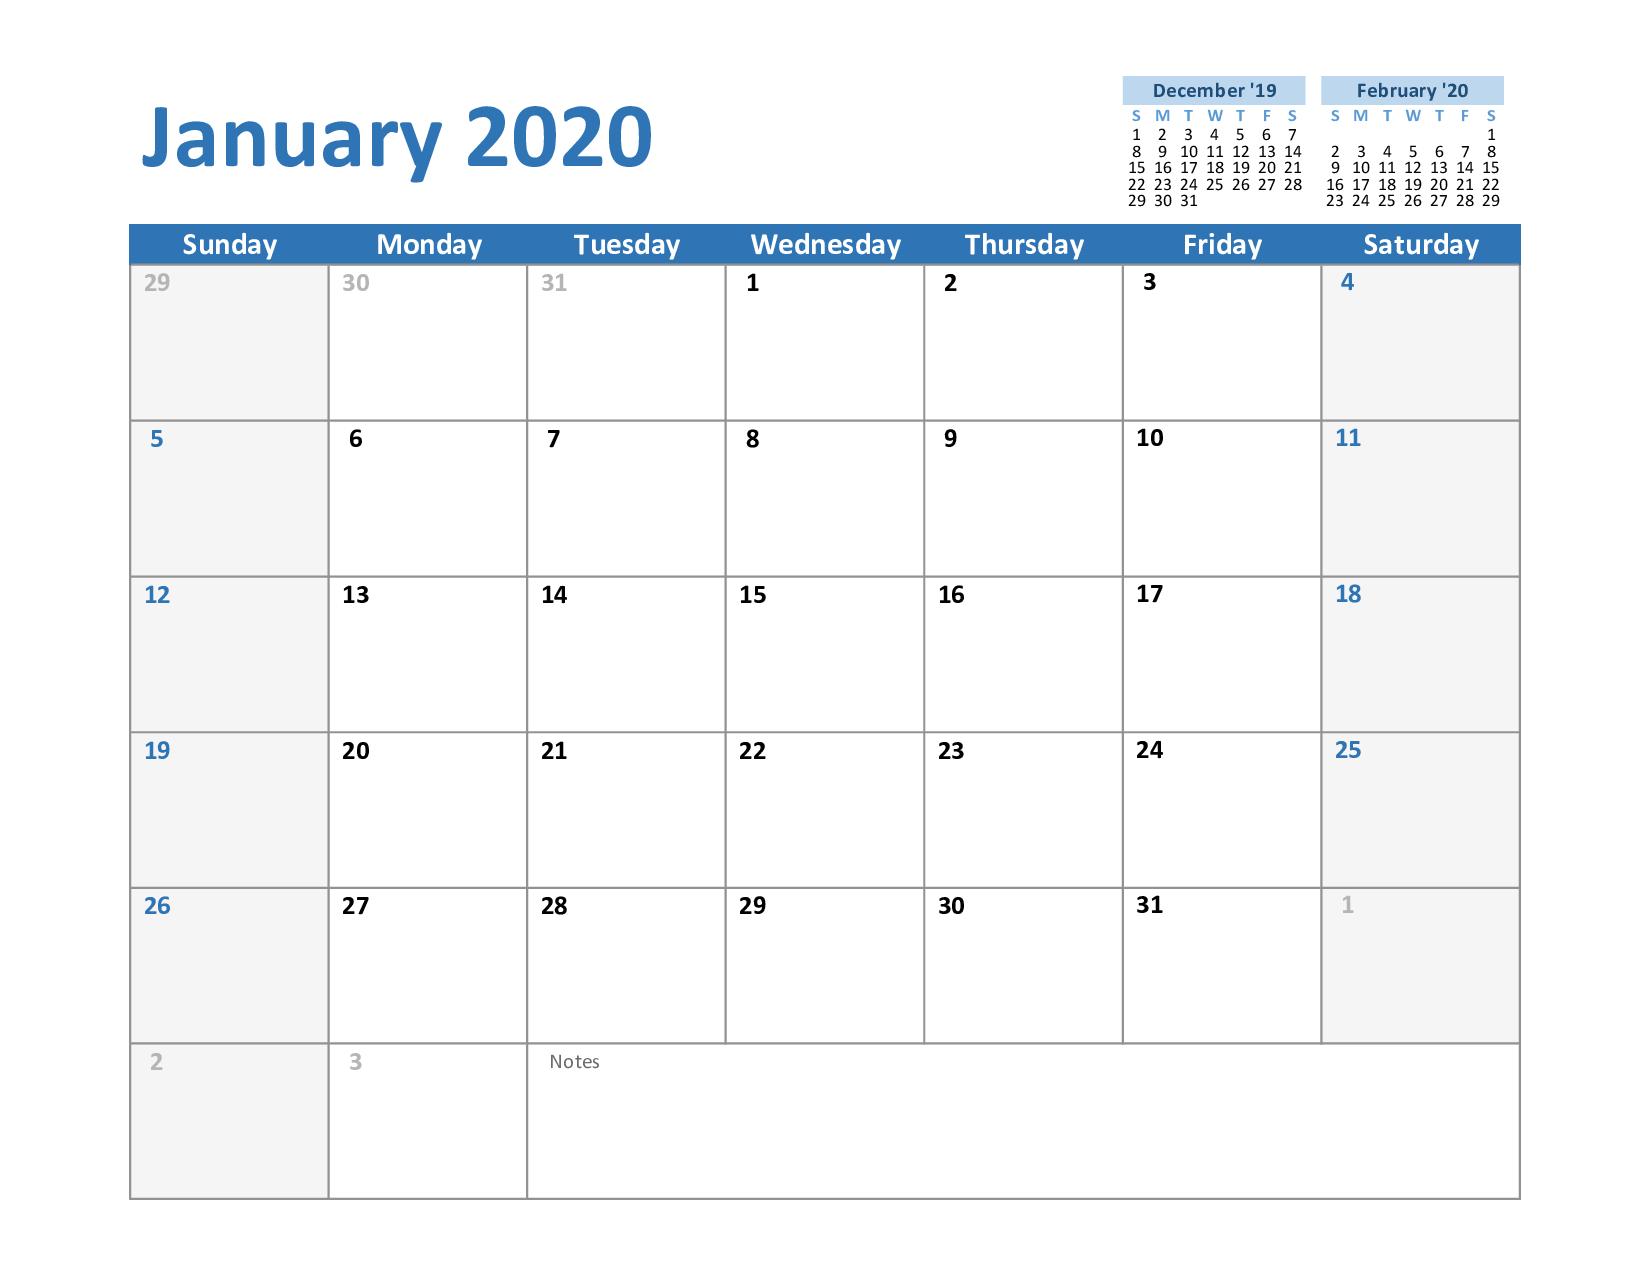 Free January Calendar 2020 Printable Template Blank In Pdf inside 2020 Employee Attendance Calendar Free